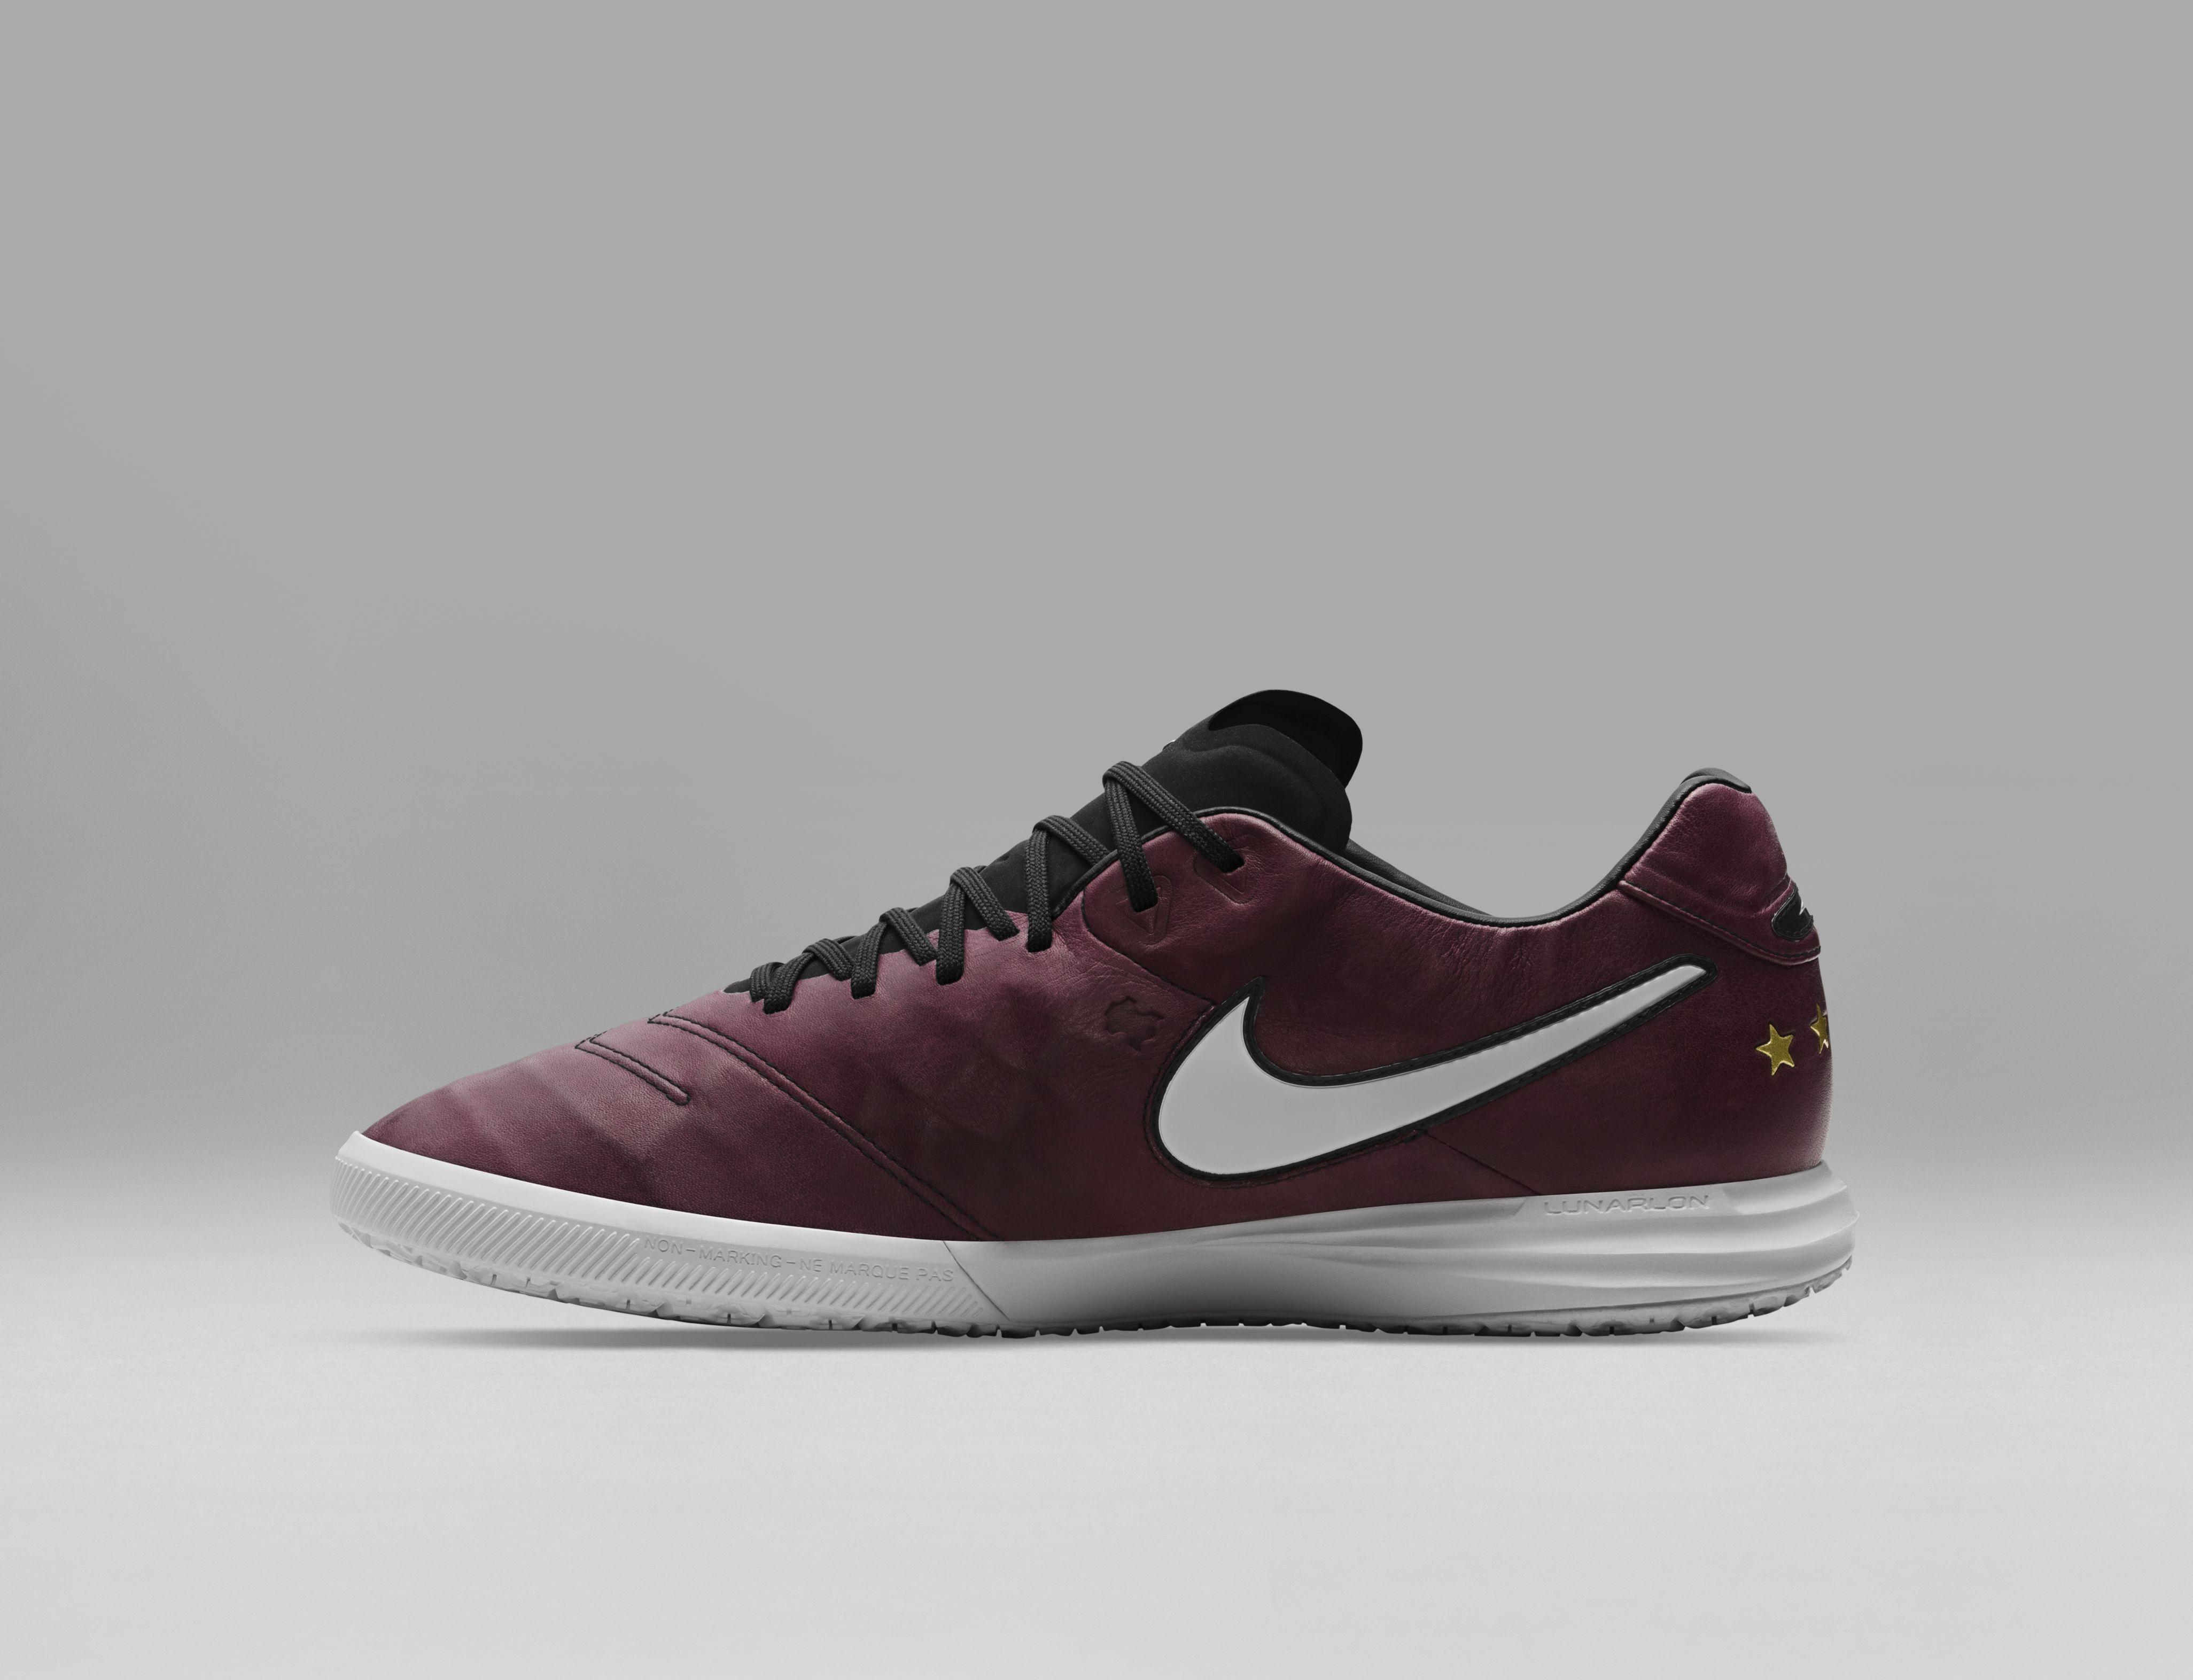 promo code 1ae81 c37af Nike News - Tiempo Pirlo